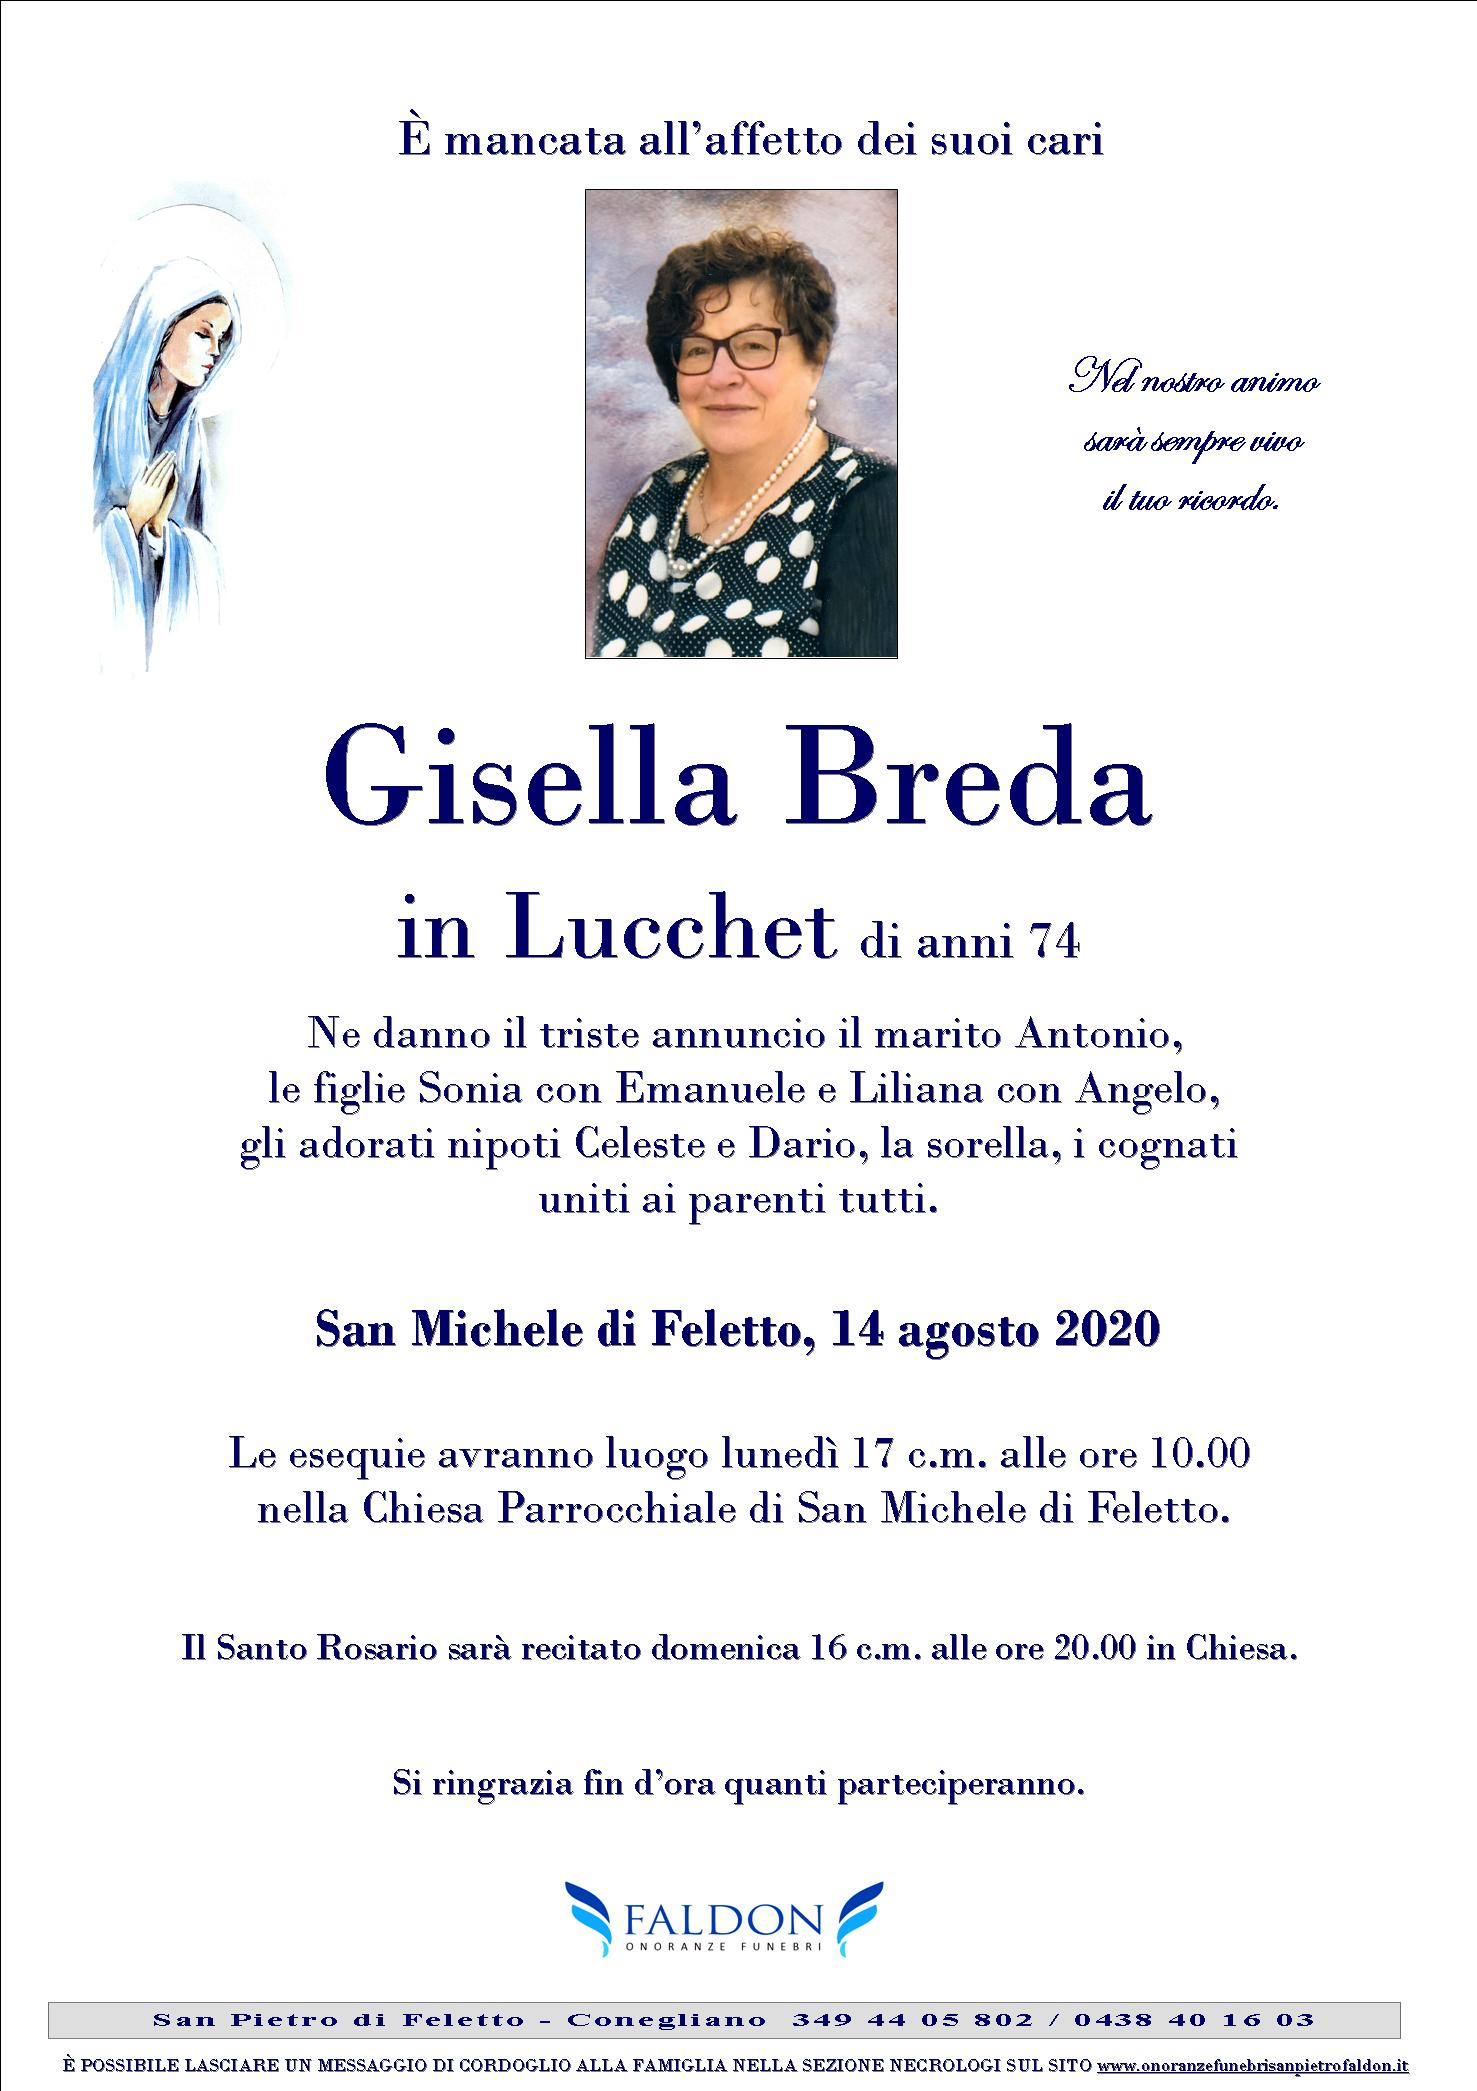 Gisella Breda